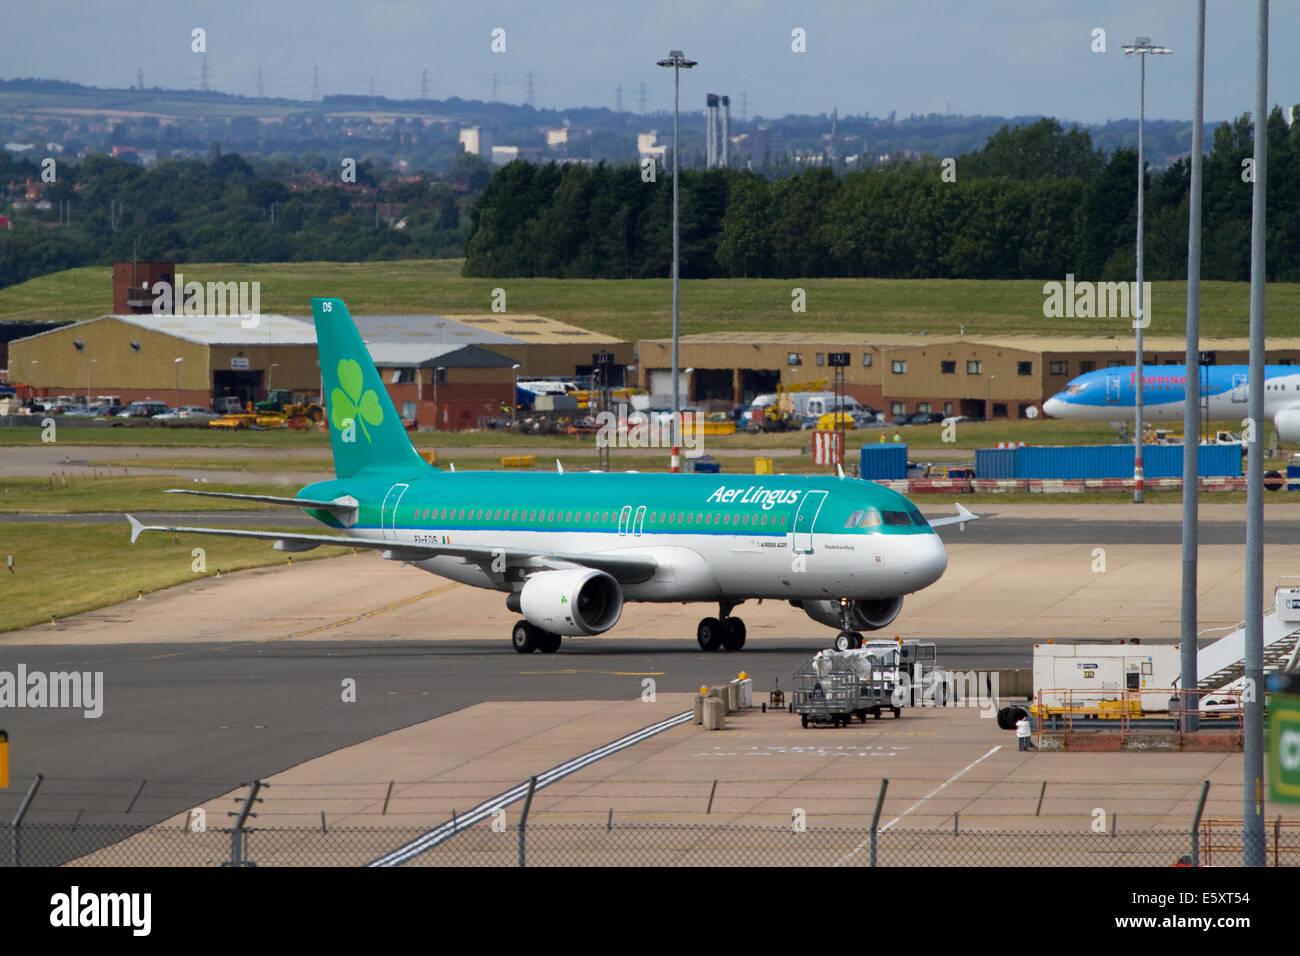 Airliner taxiing. Birmingham Airport - Stock Image